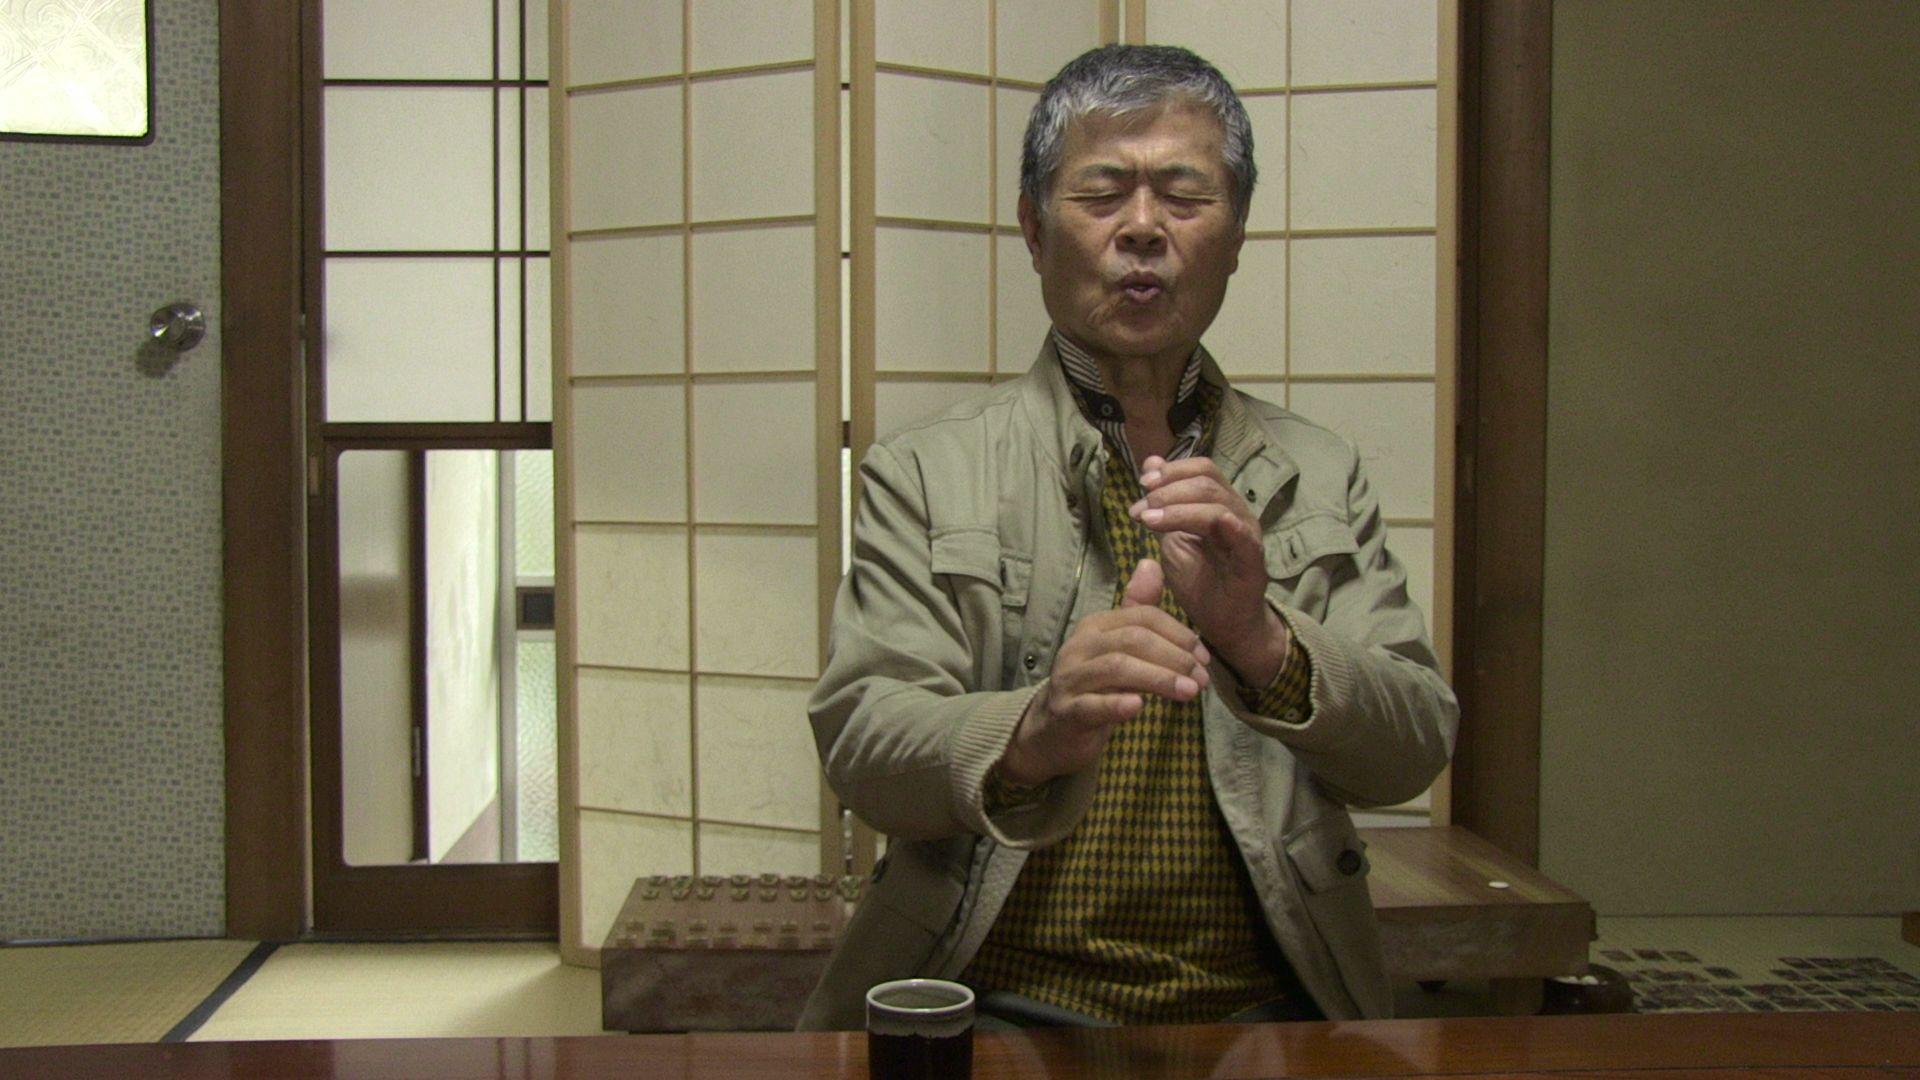 sendai ohashi interview plays invisible shakuhachi framegrab.jpg